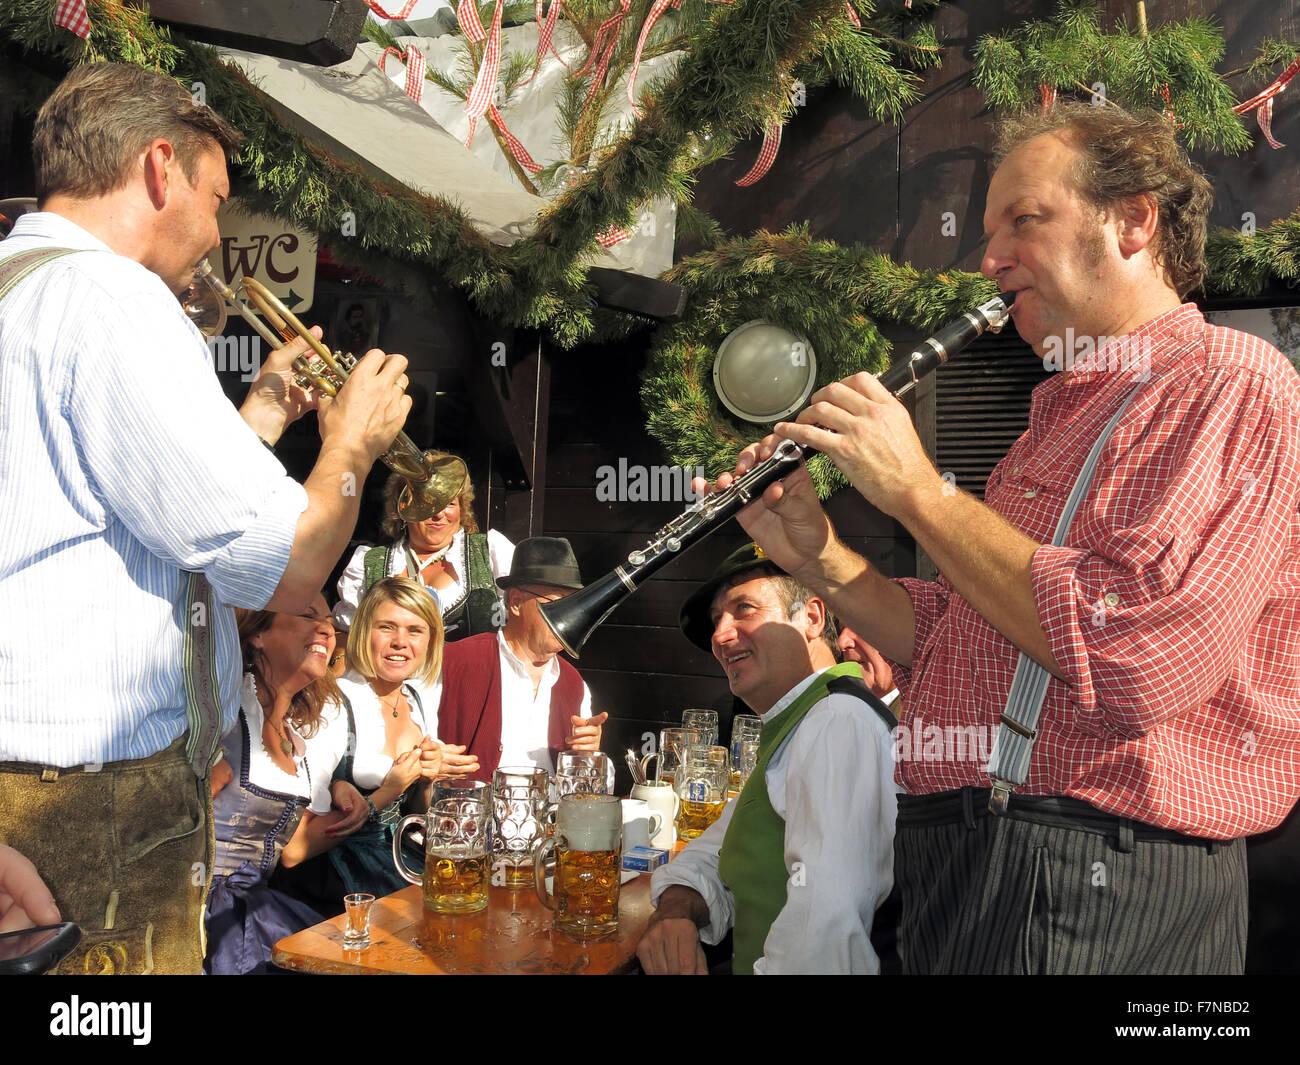 Garden Scenes at Munich Oktoberfest Beer Festival - Stock Image